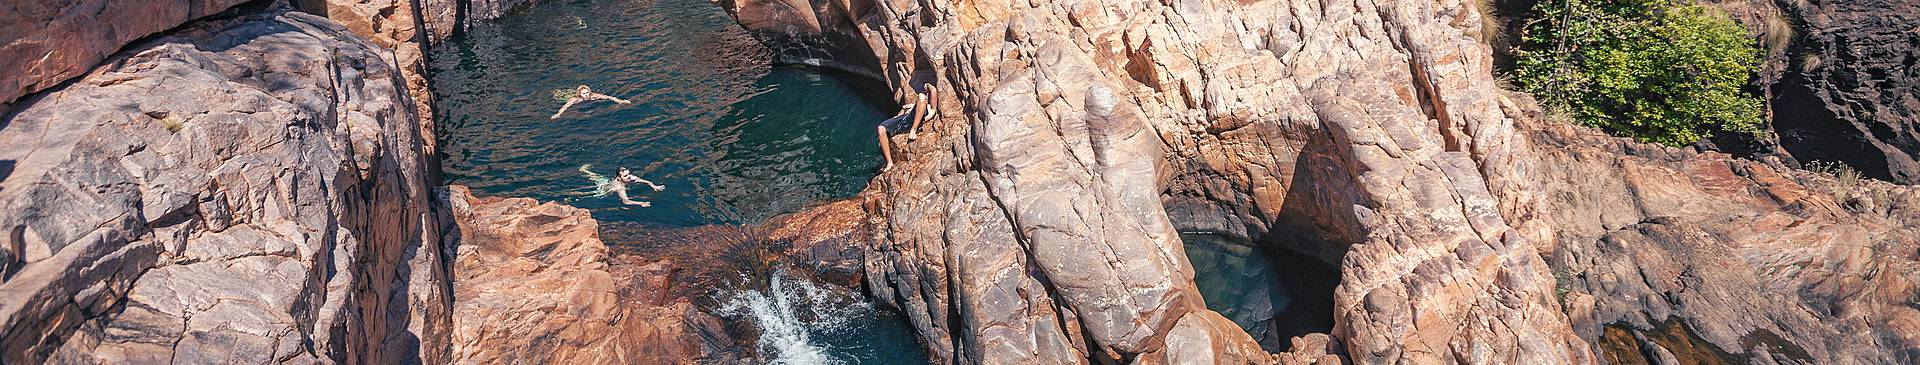 Wellness retreats in Australia